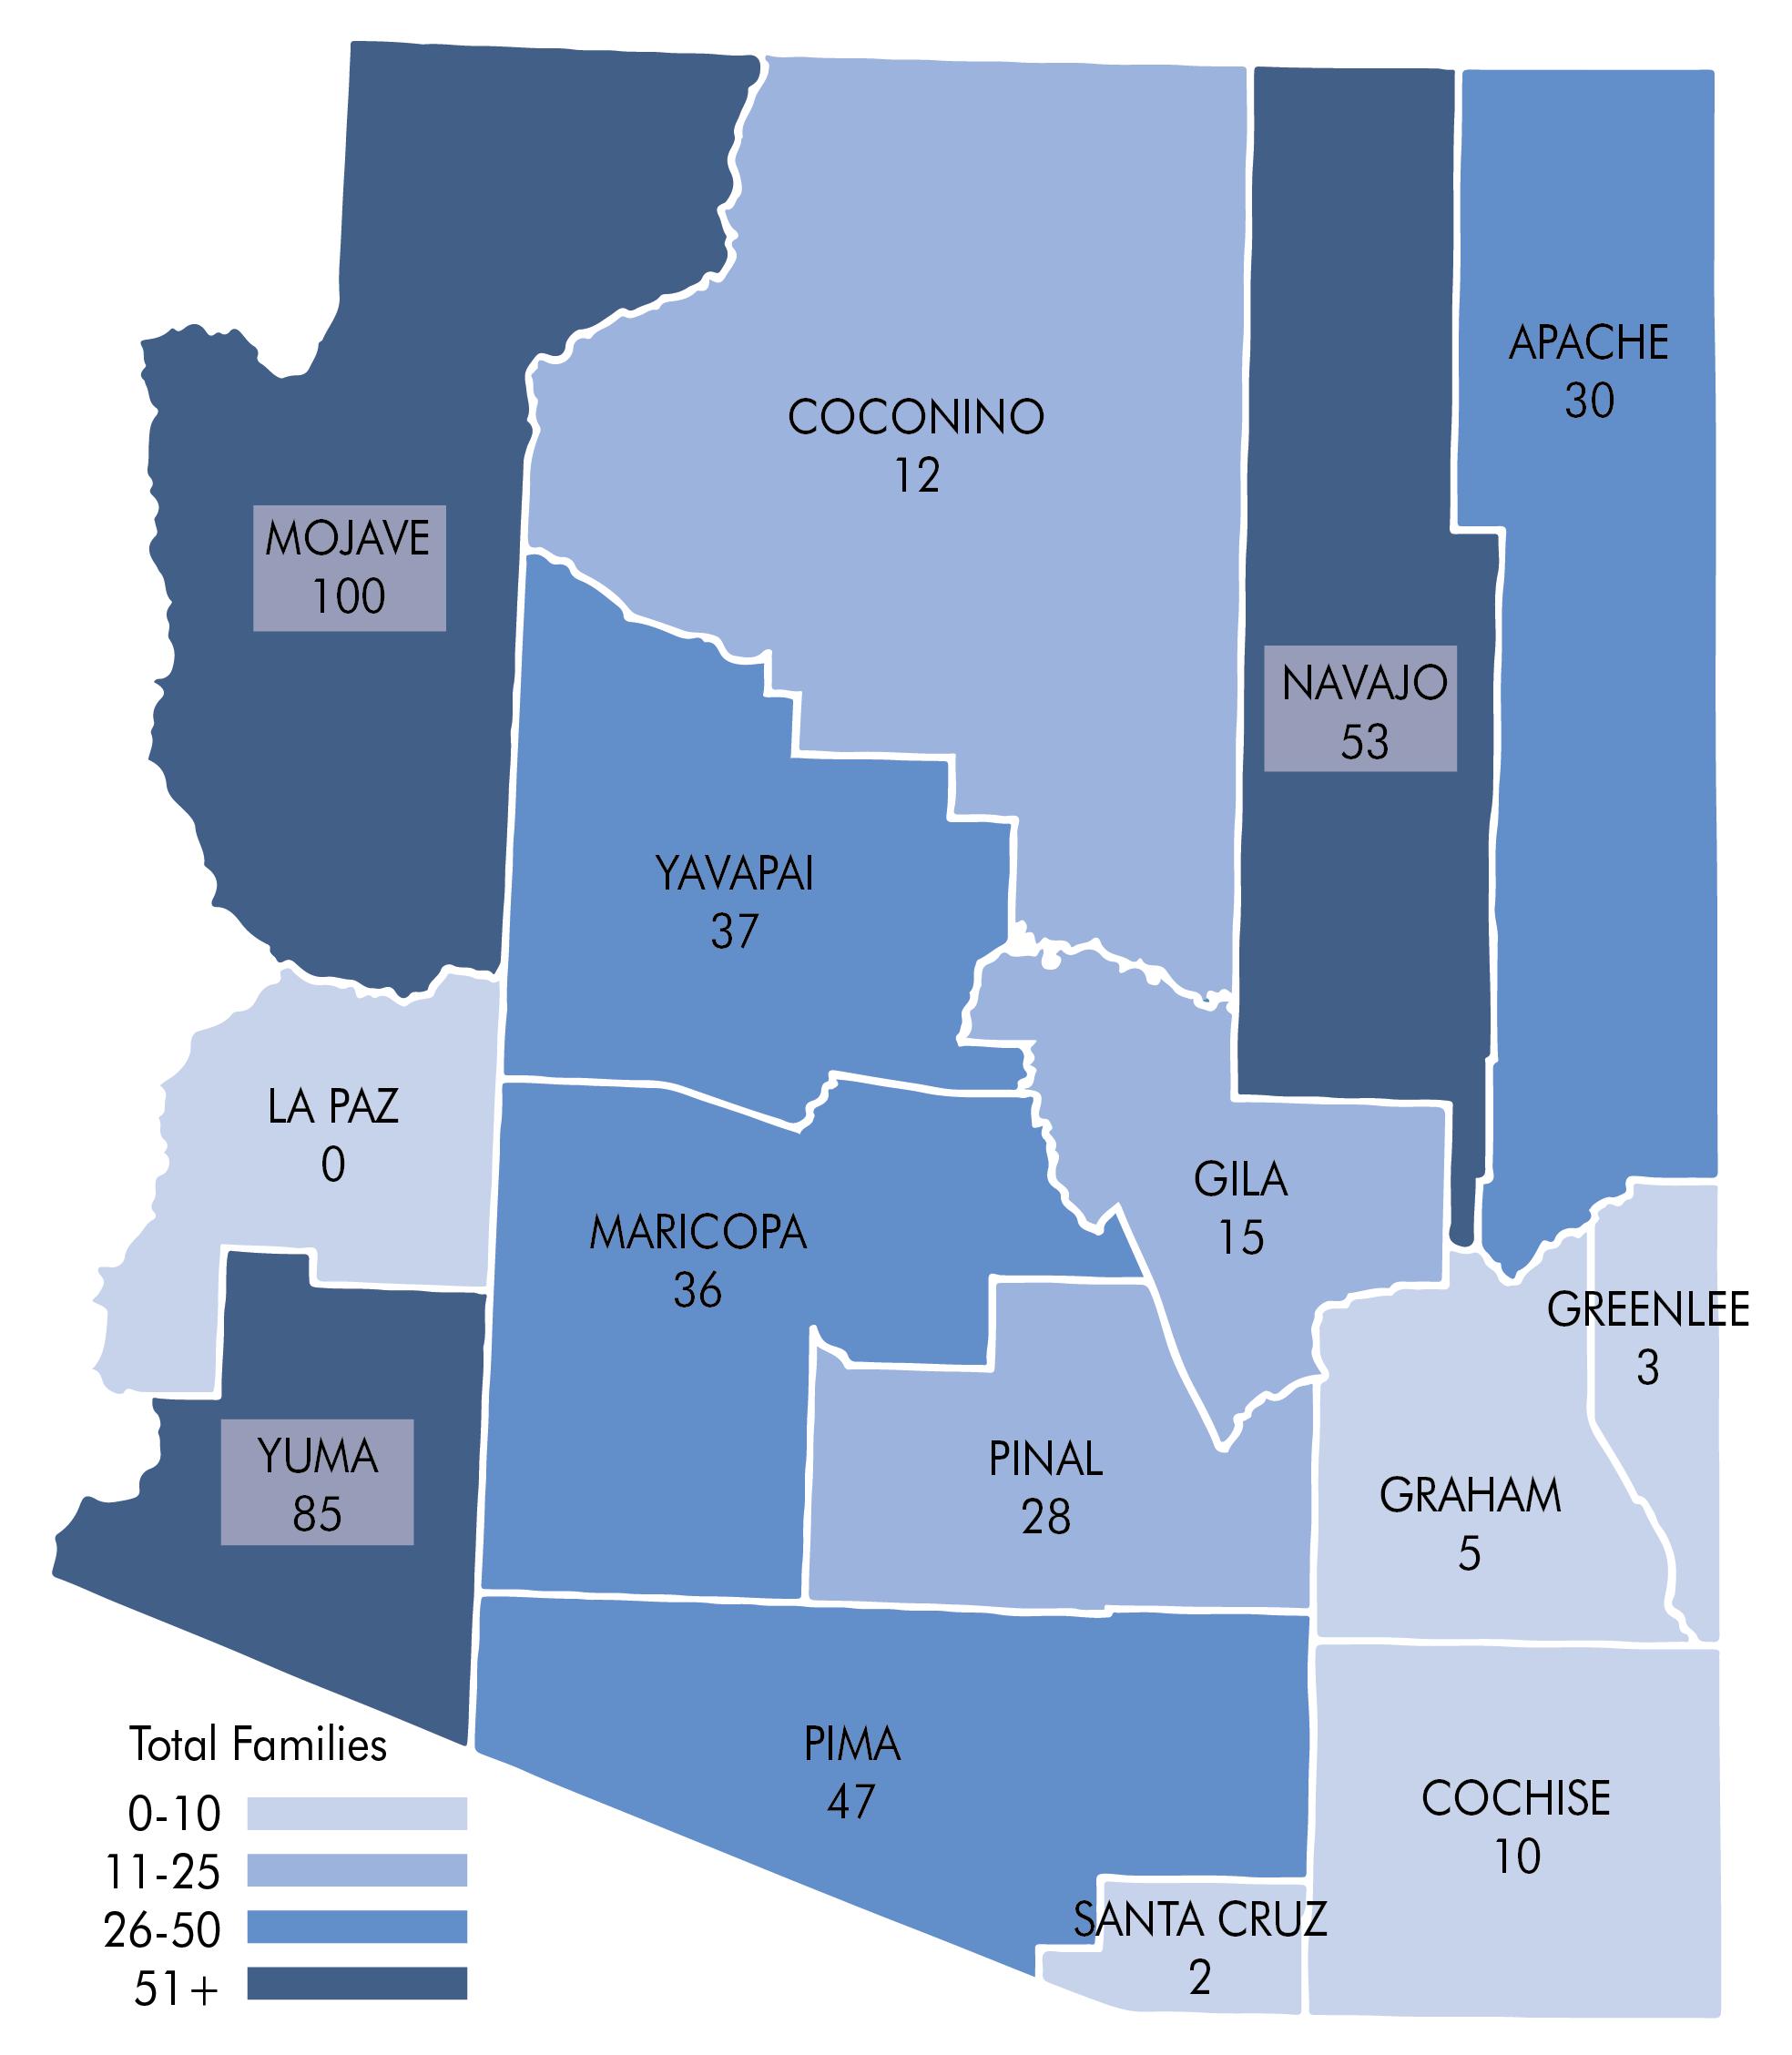 County breakdown map of Arizona